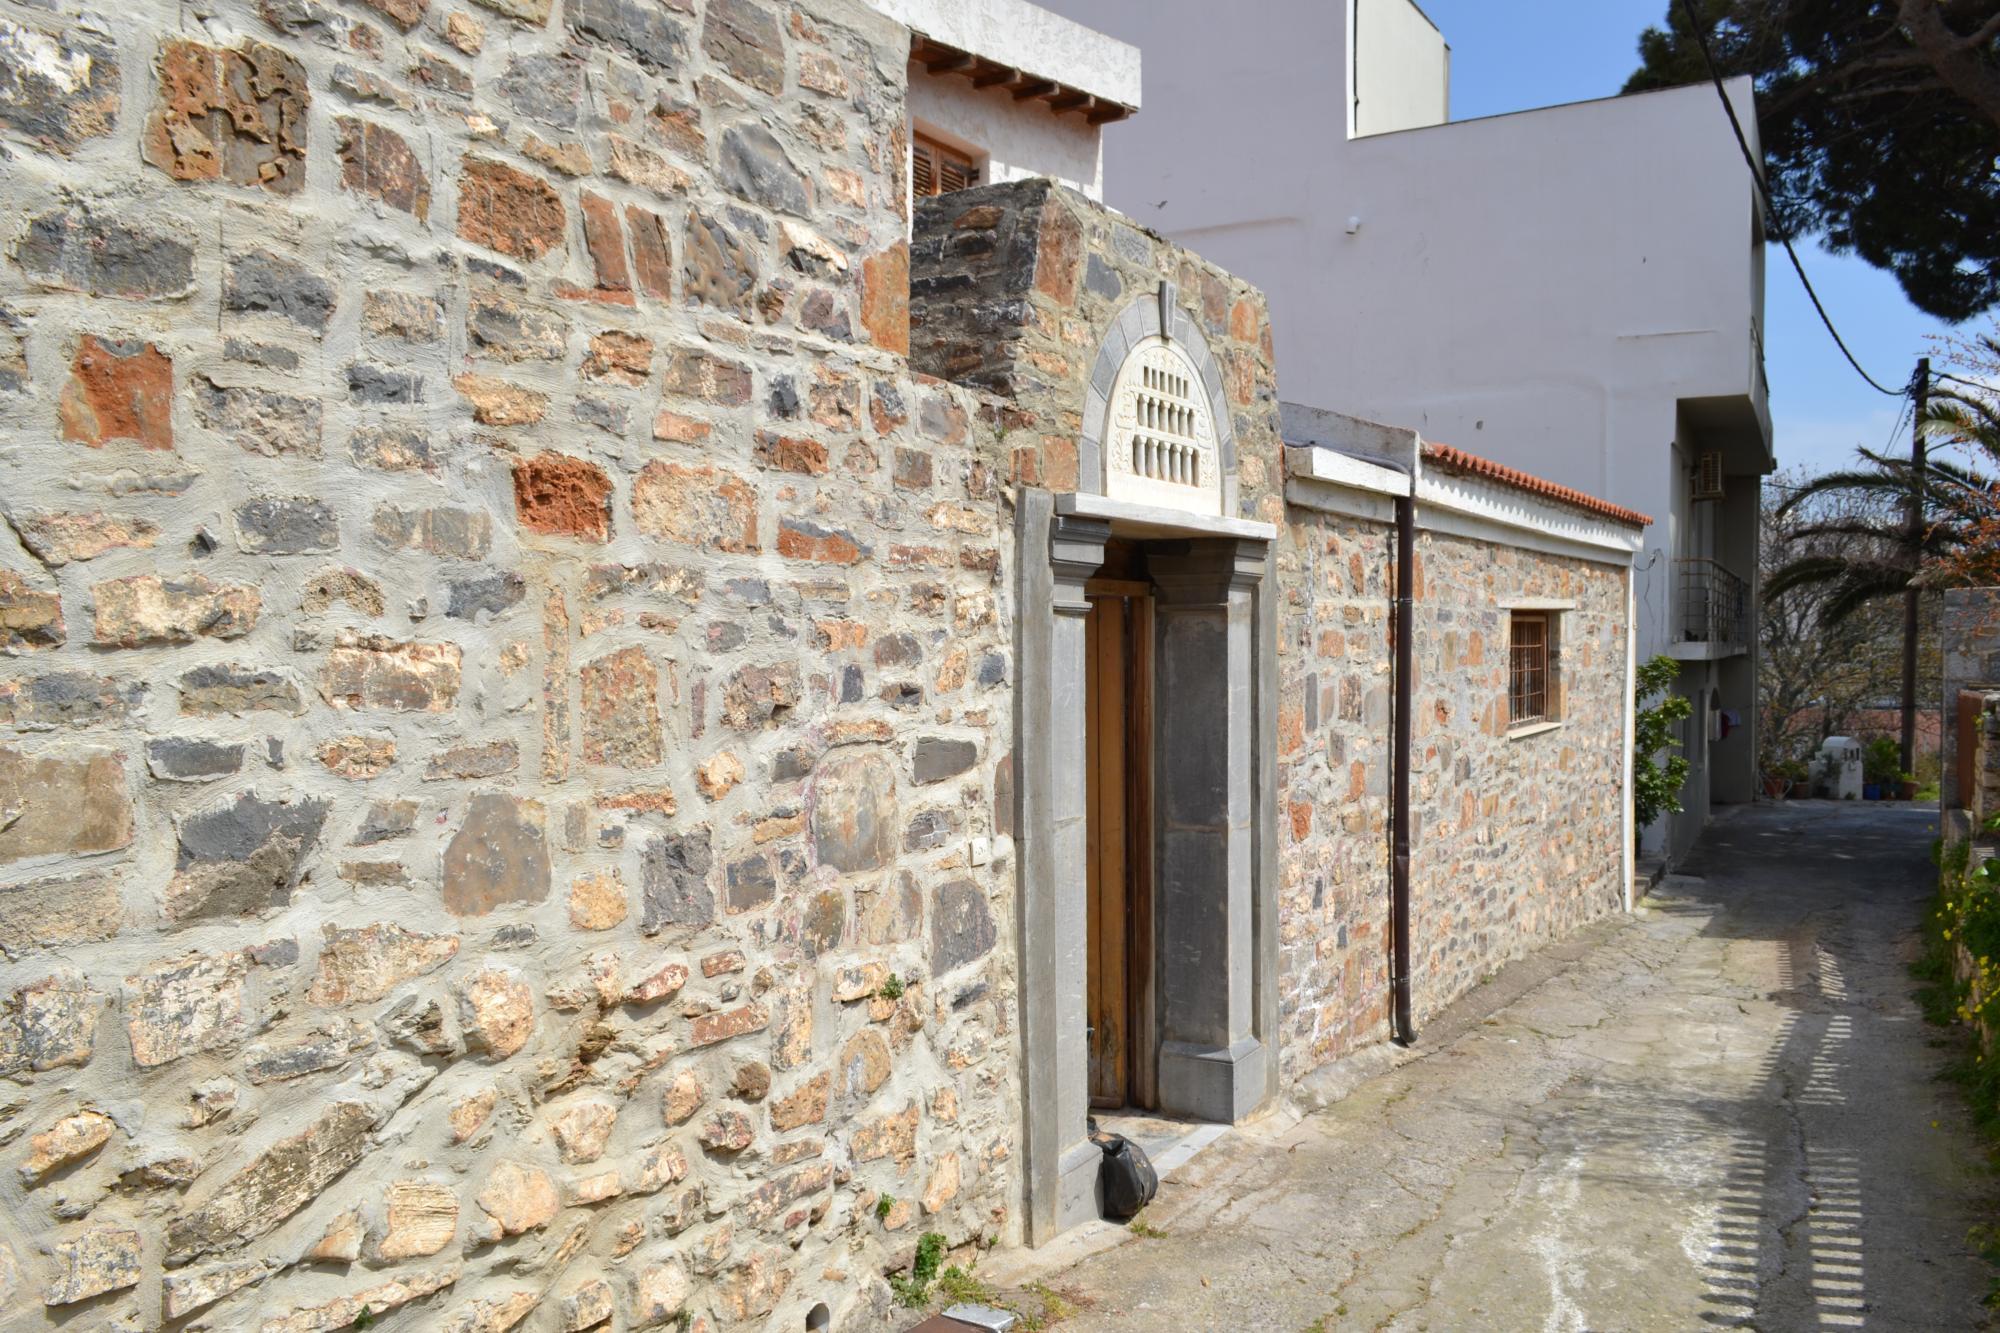 Large 3 bedroom Monastery style house with big balcony and courtyard.